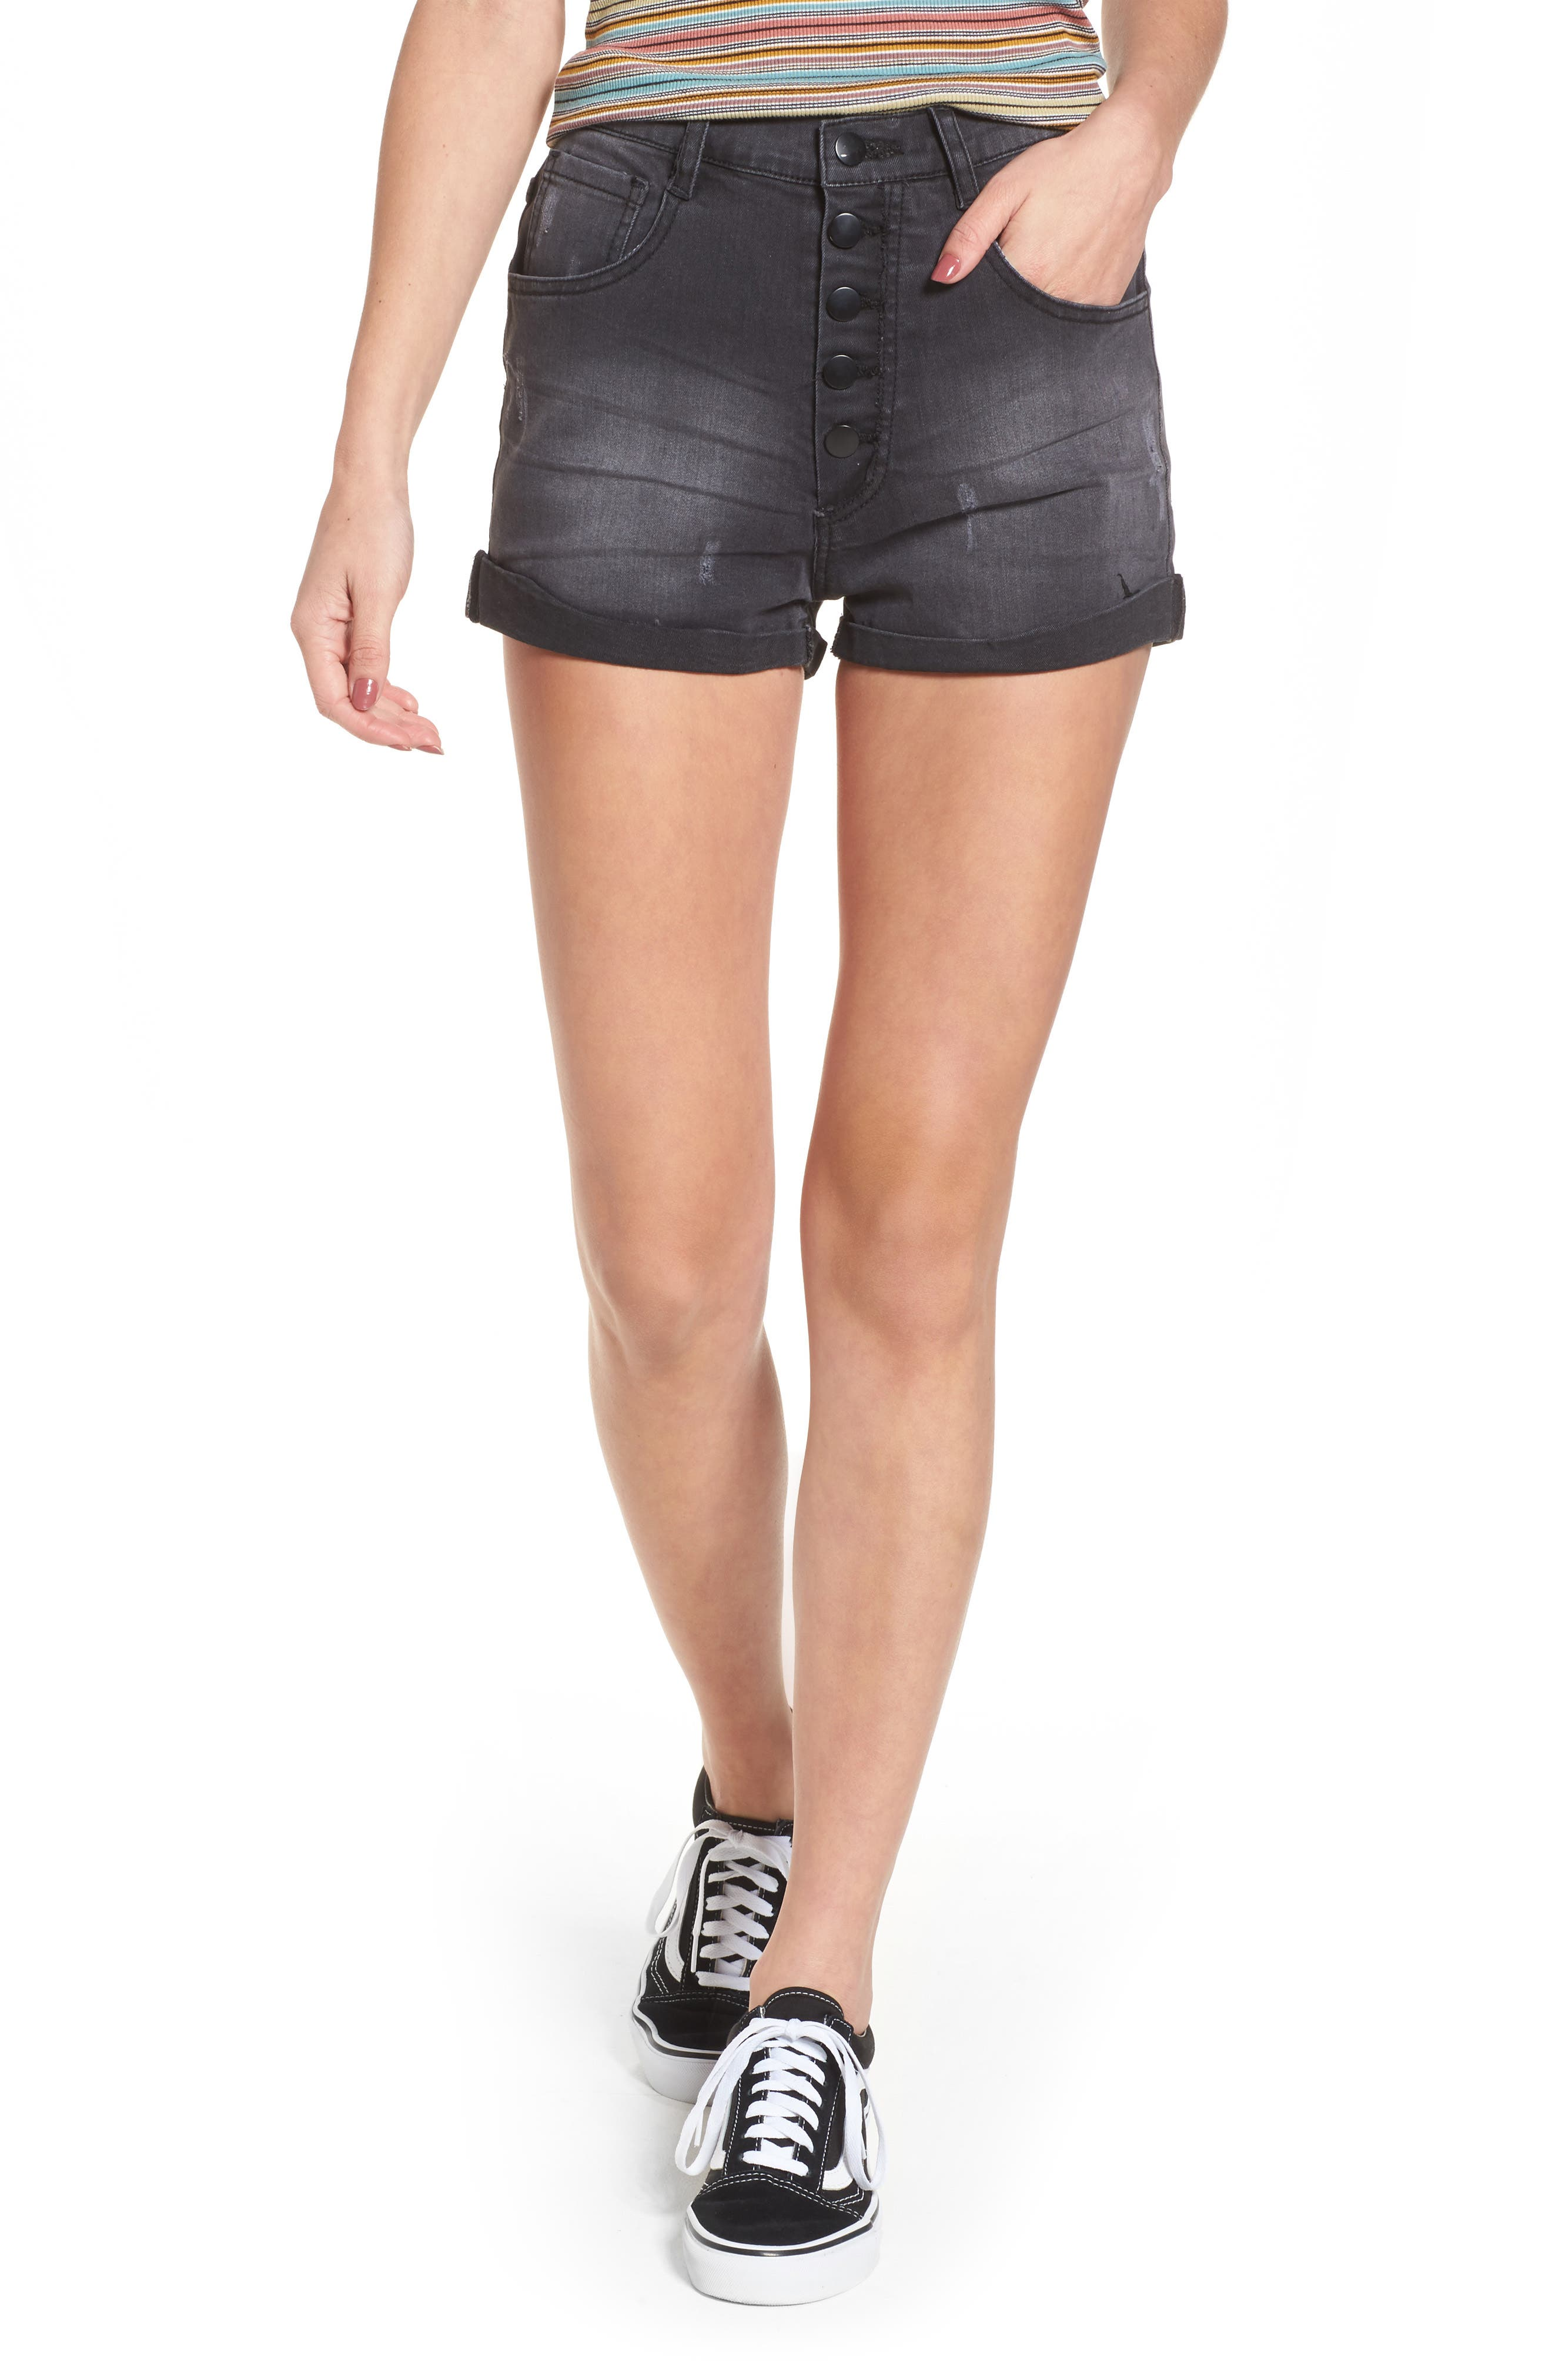 Lira Clothing Rachel High Waisted Denim Shorts